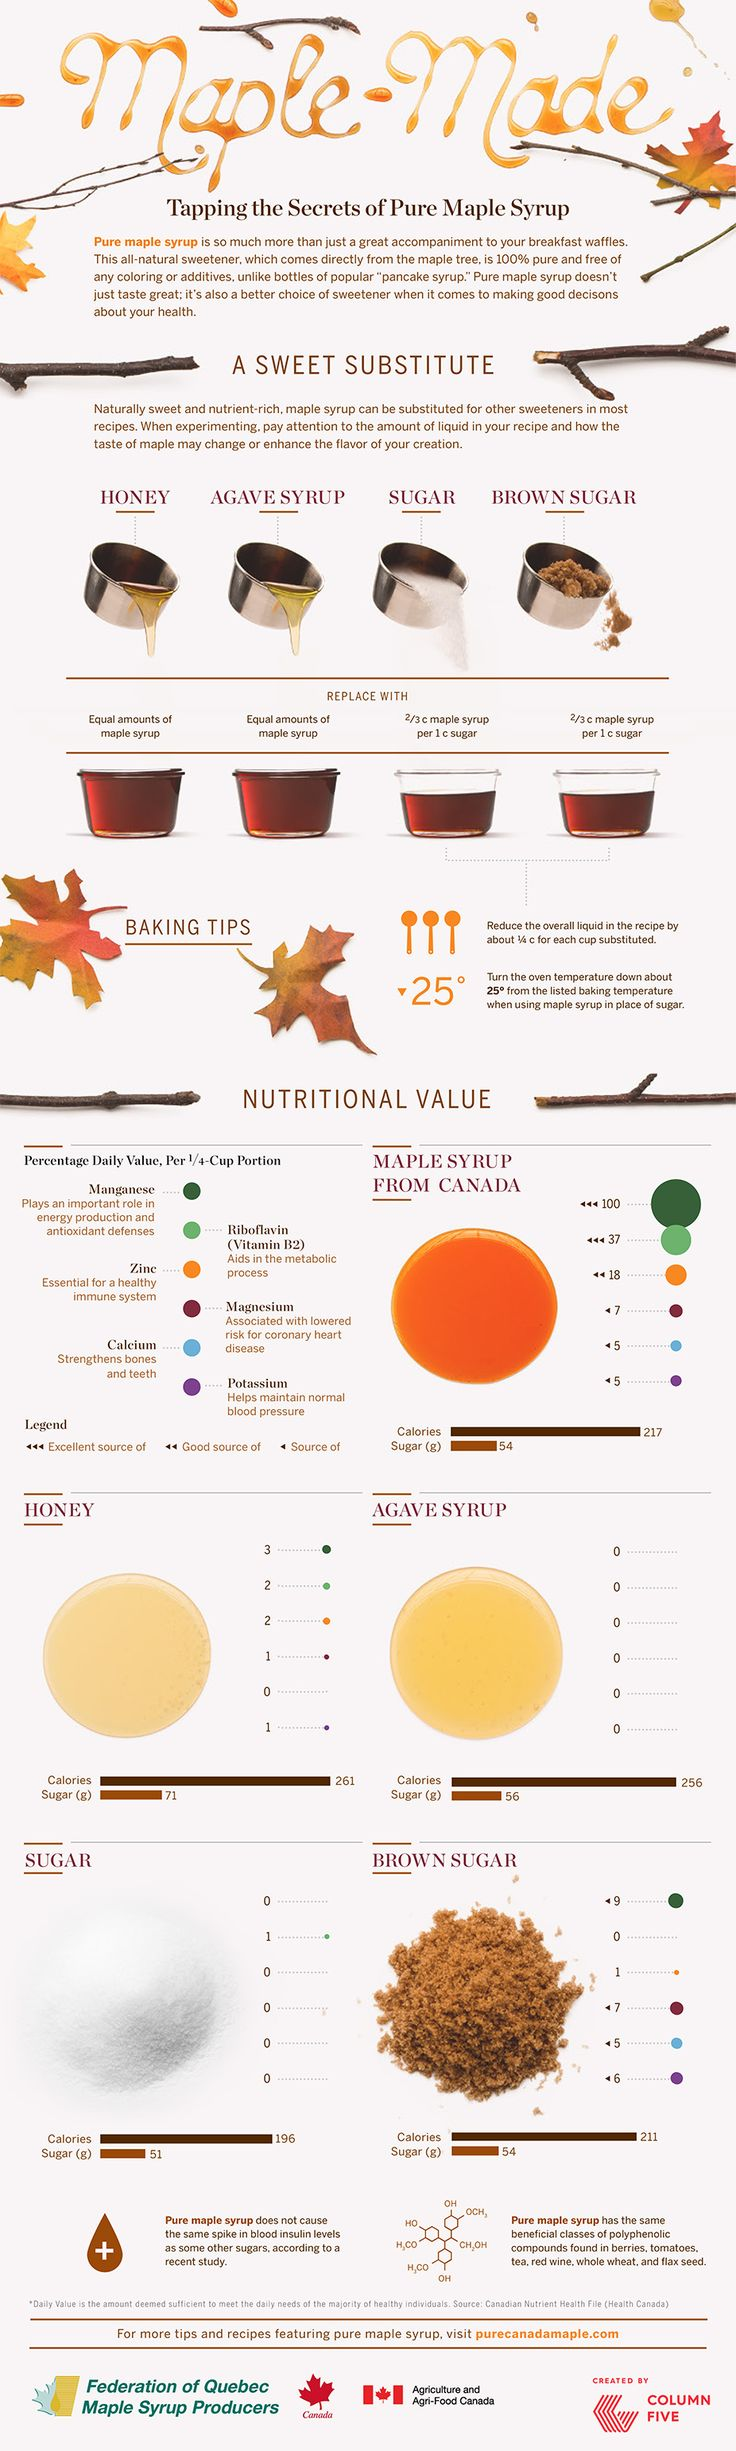 Maple Sugar Alternative Infographic #MapleSyrup #Vegan #GlutenFree